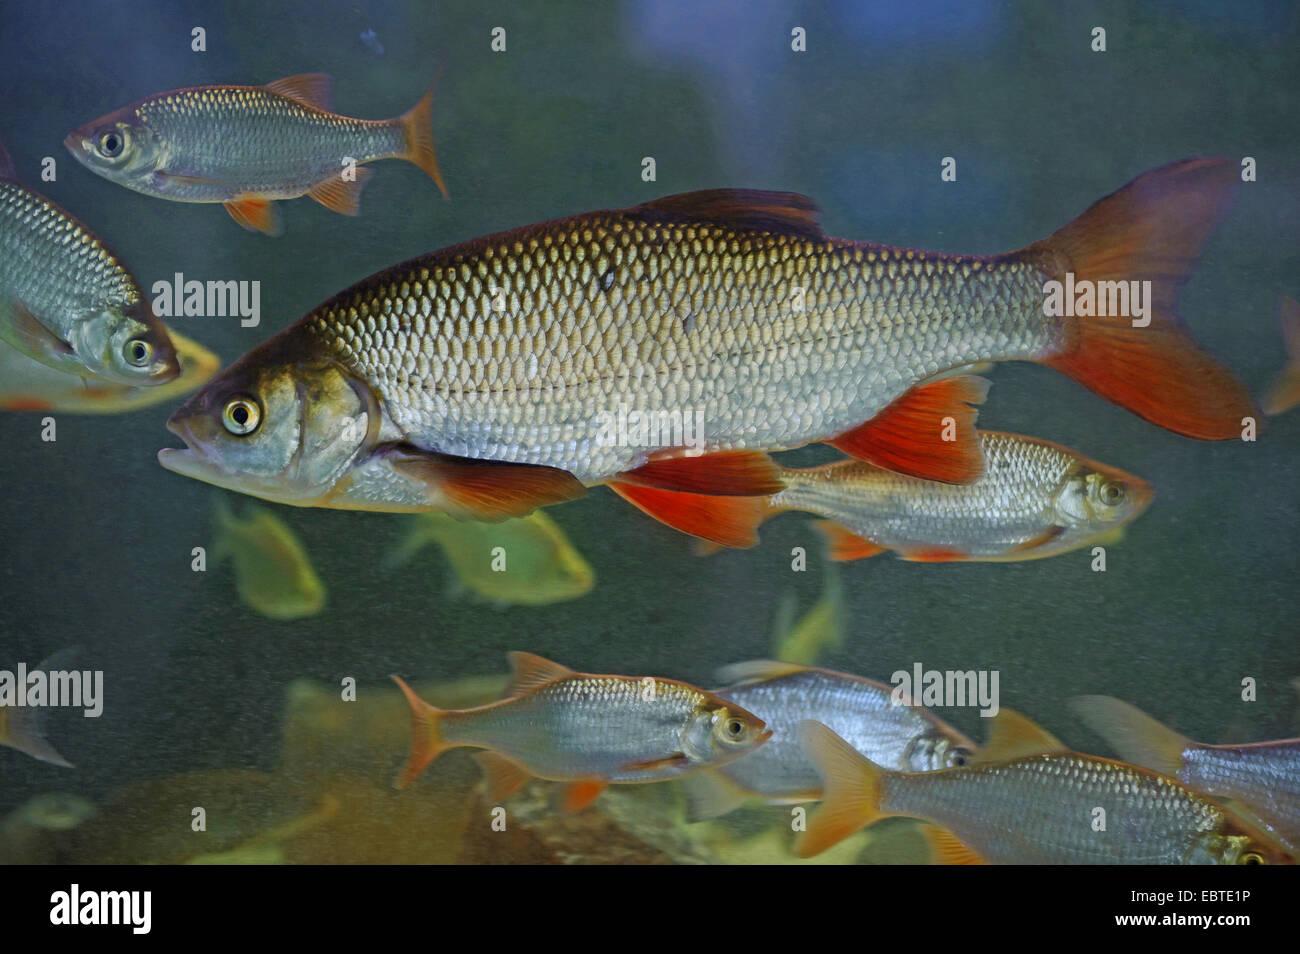 rudd (Scardinius erythrophthalmus), shoal, Vechta, Niedersachsen, Germany Stock Photo